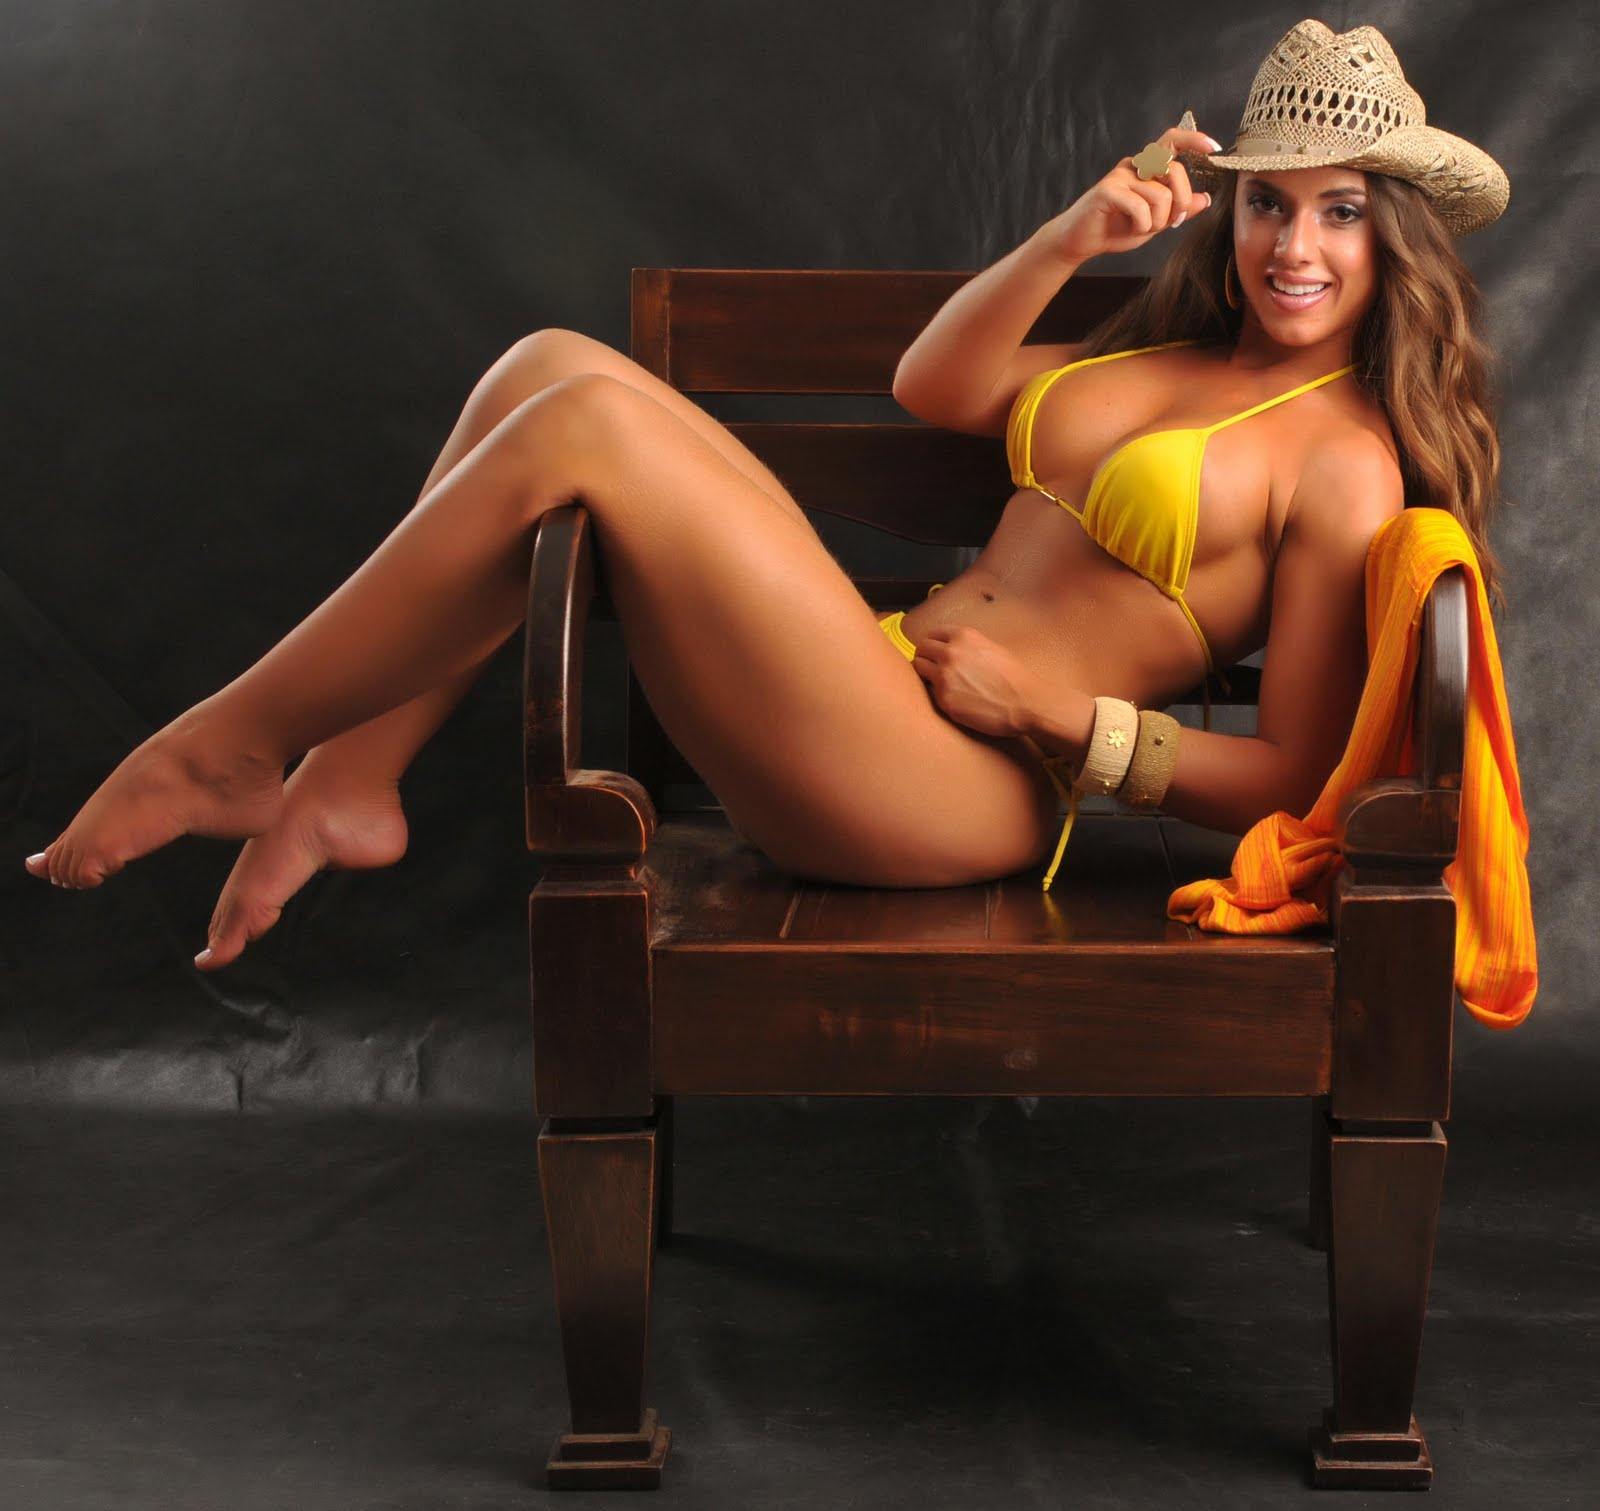 Nicole bahls hot, black booty public